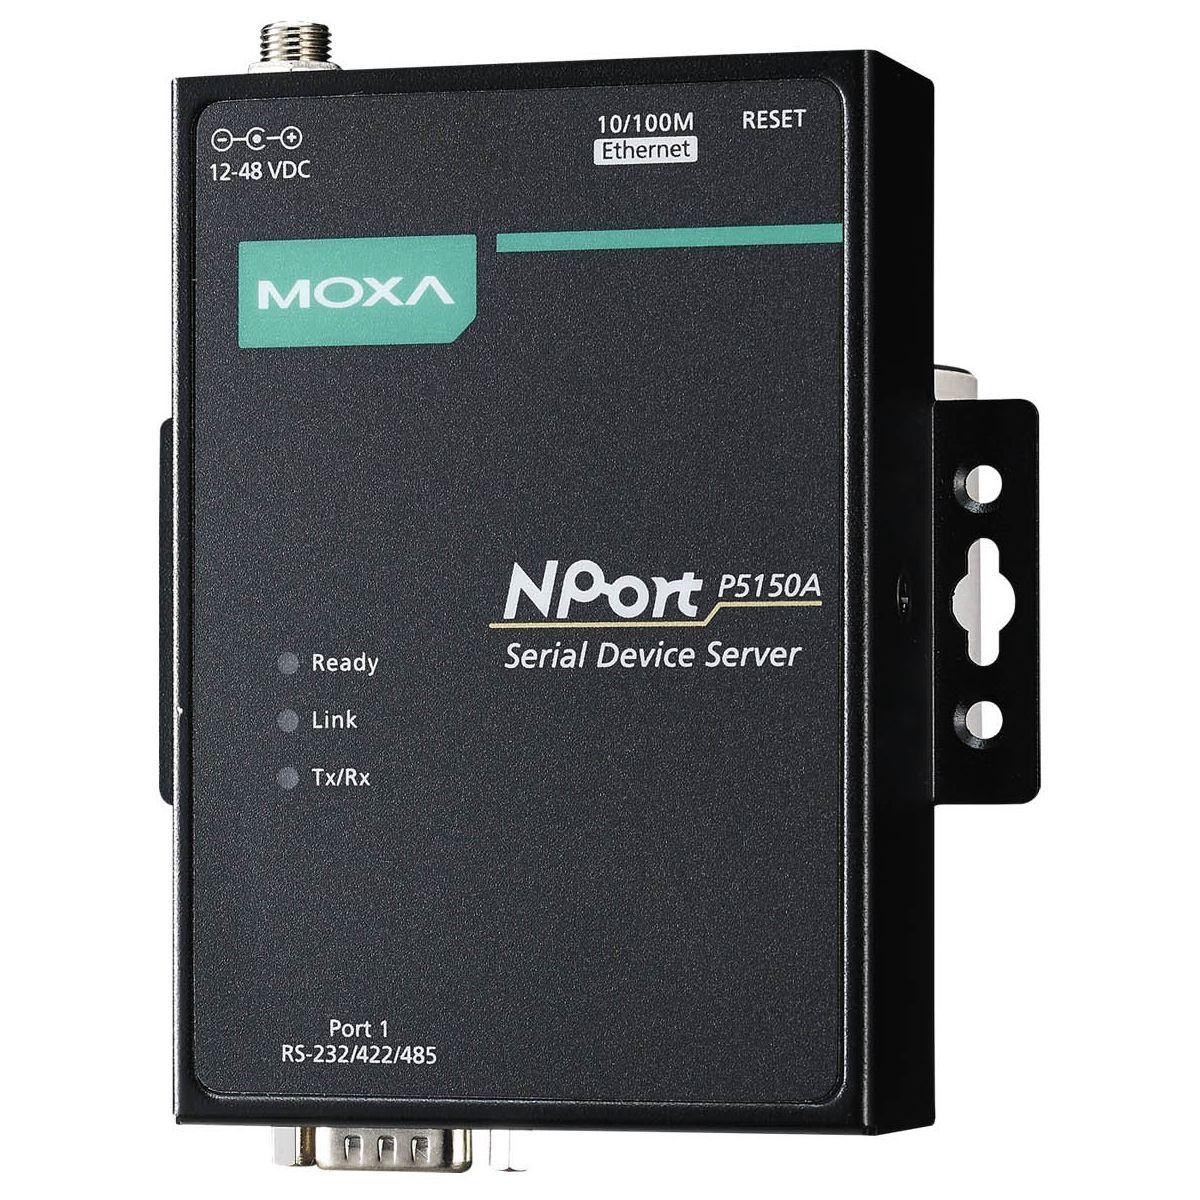 NPort P5150A